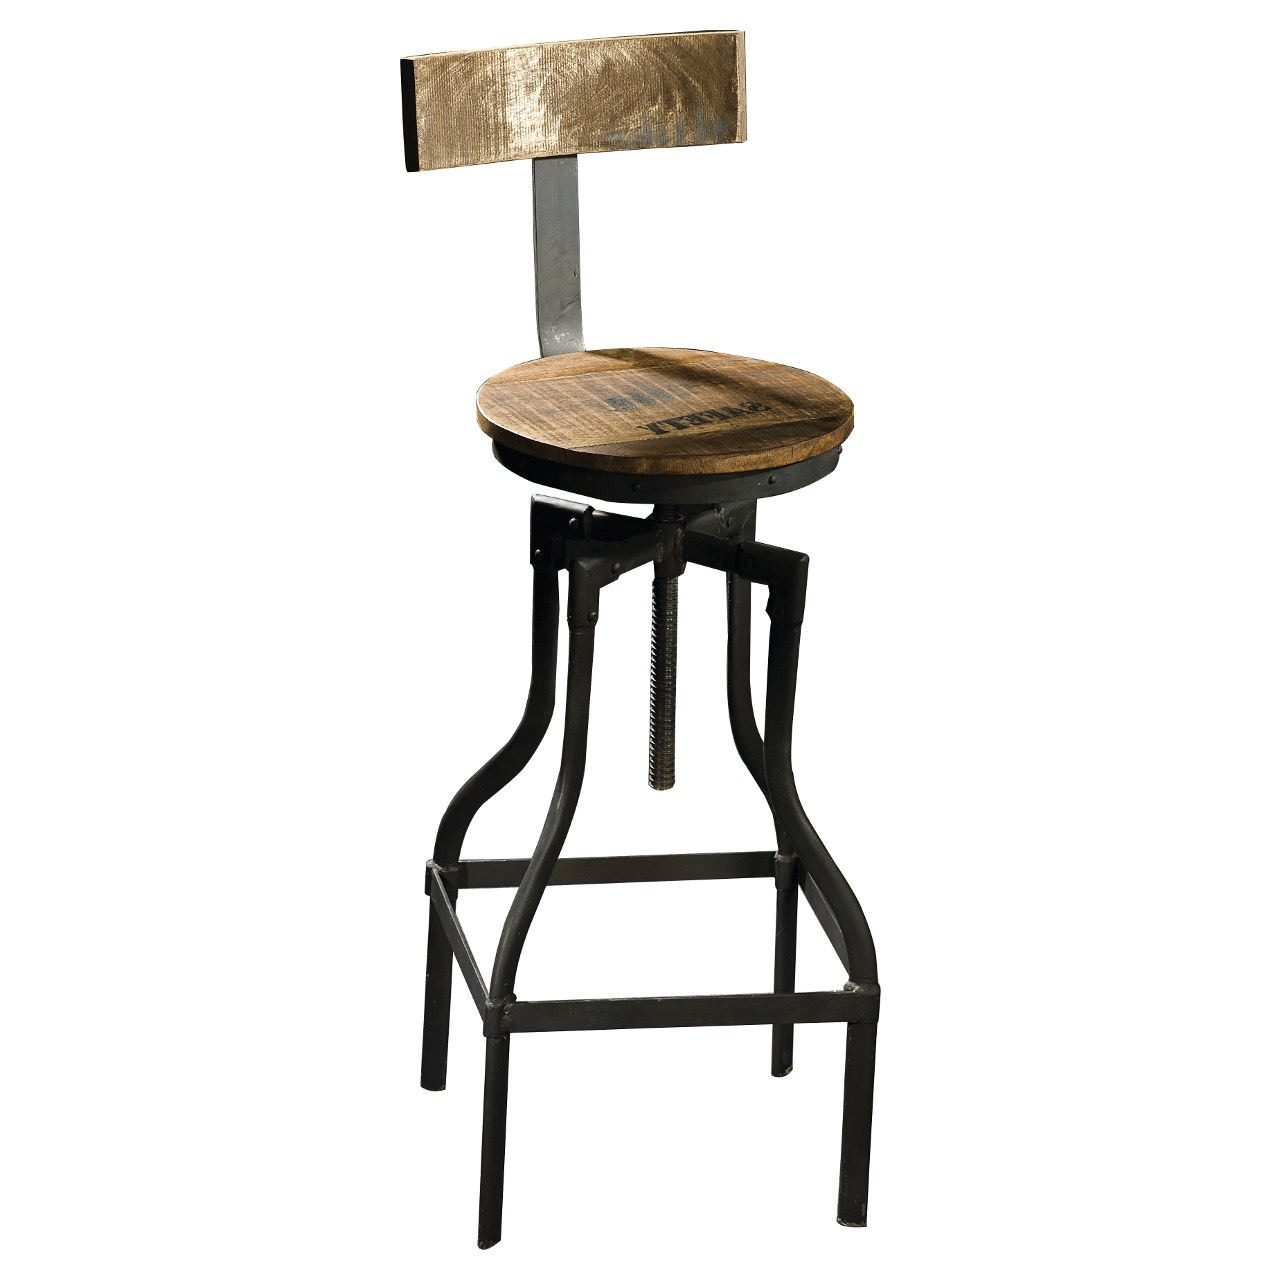 crank-bar-stool-with-back_1